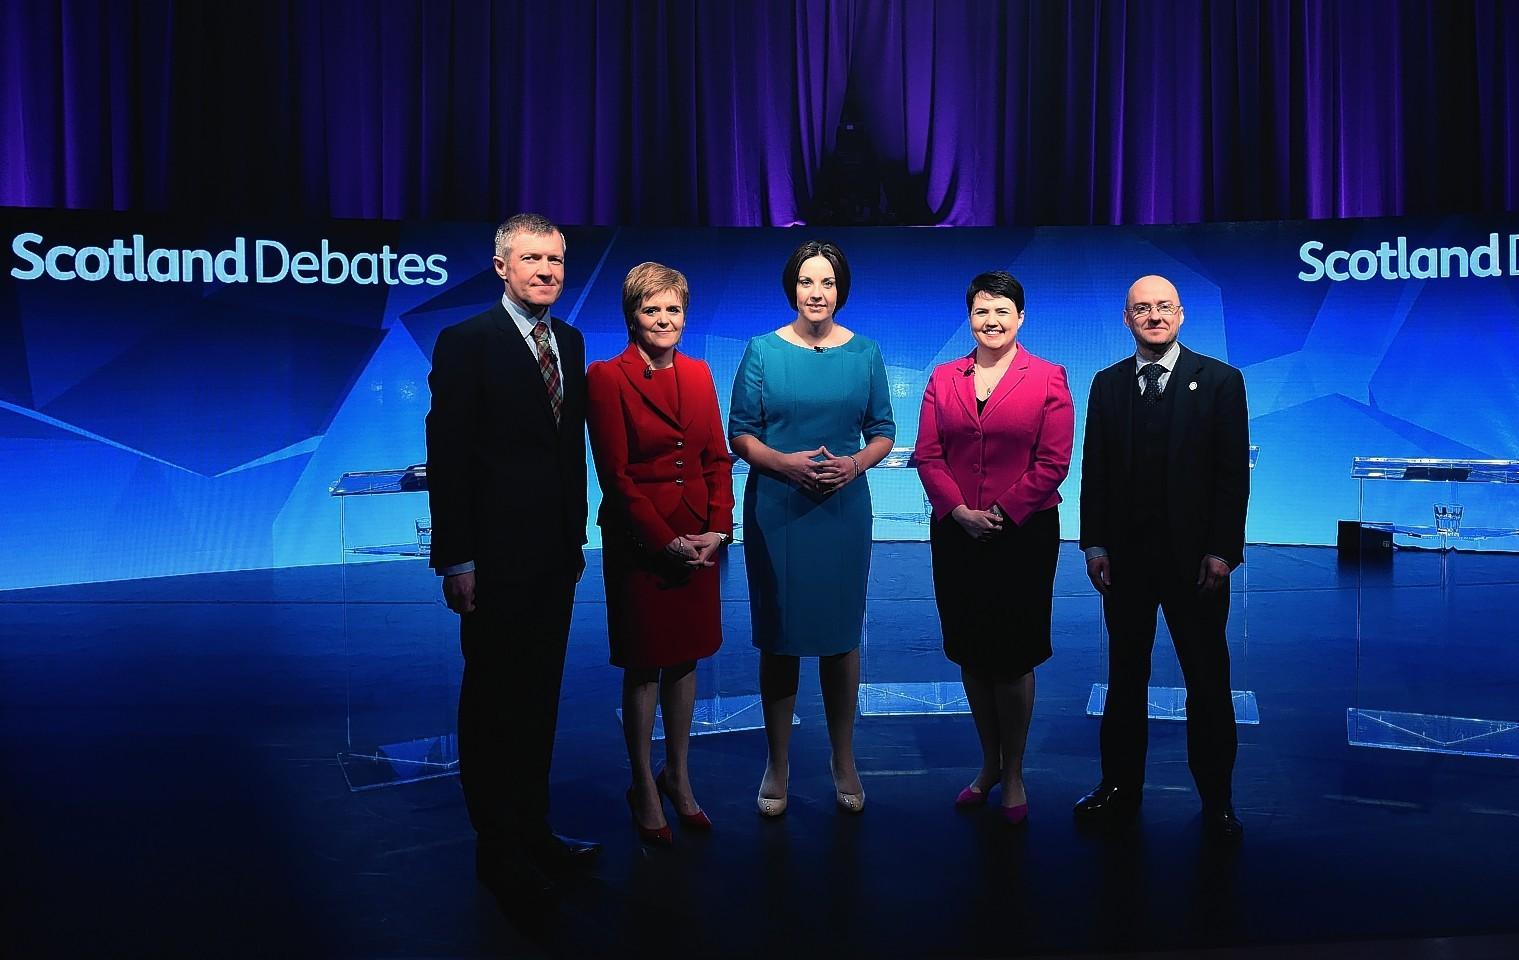 Lib Dem Willie Rennie, SNP leader Nicola Sturgeon, Scottish Labour's Kezia Dugdale, Ruth Davidson of the Scottish Conservatives, and Patrick Harvie of the Scottish Greens